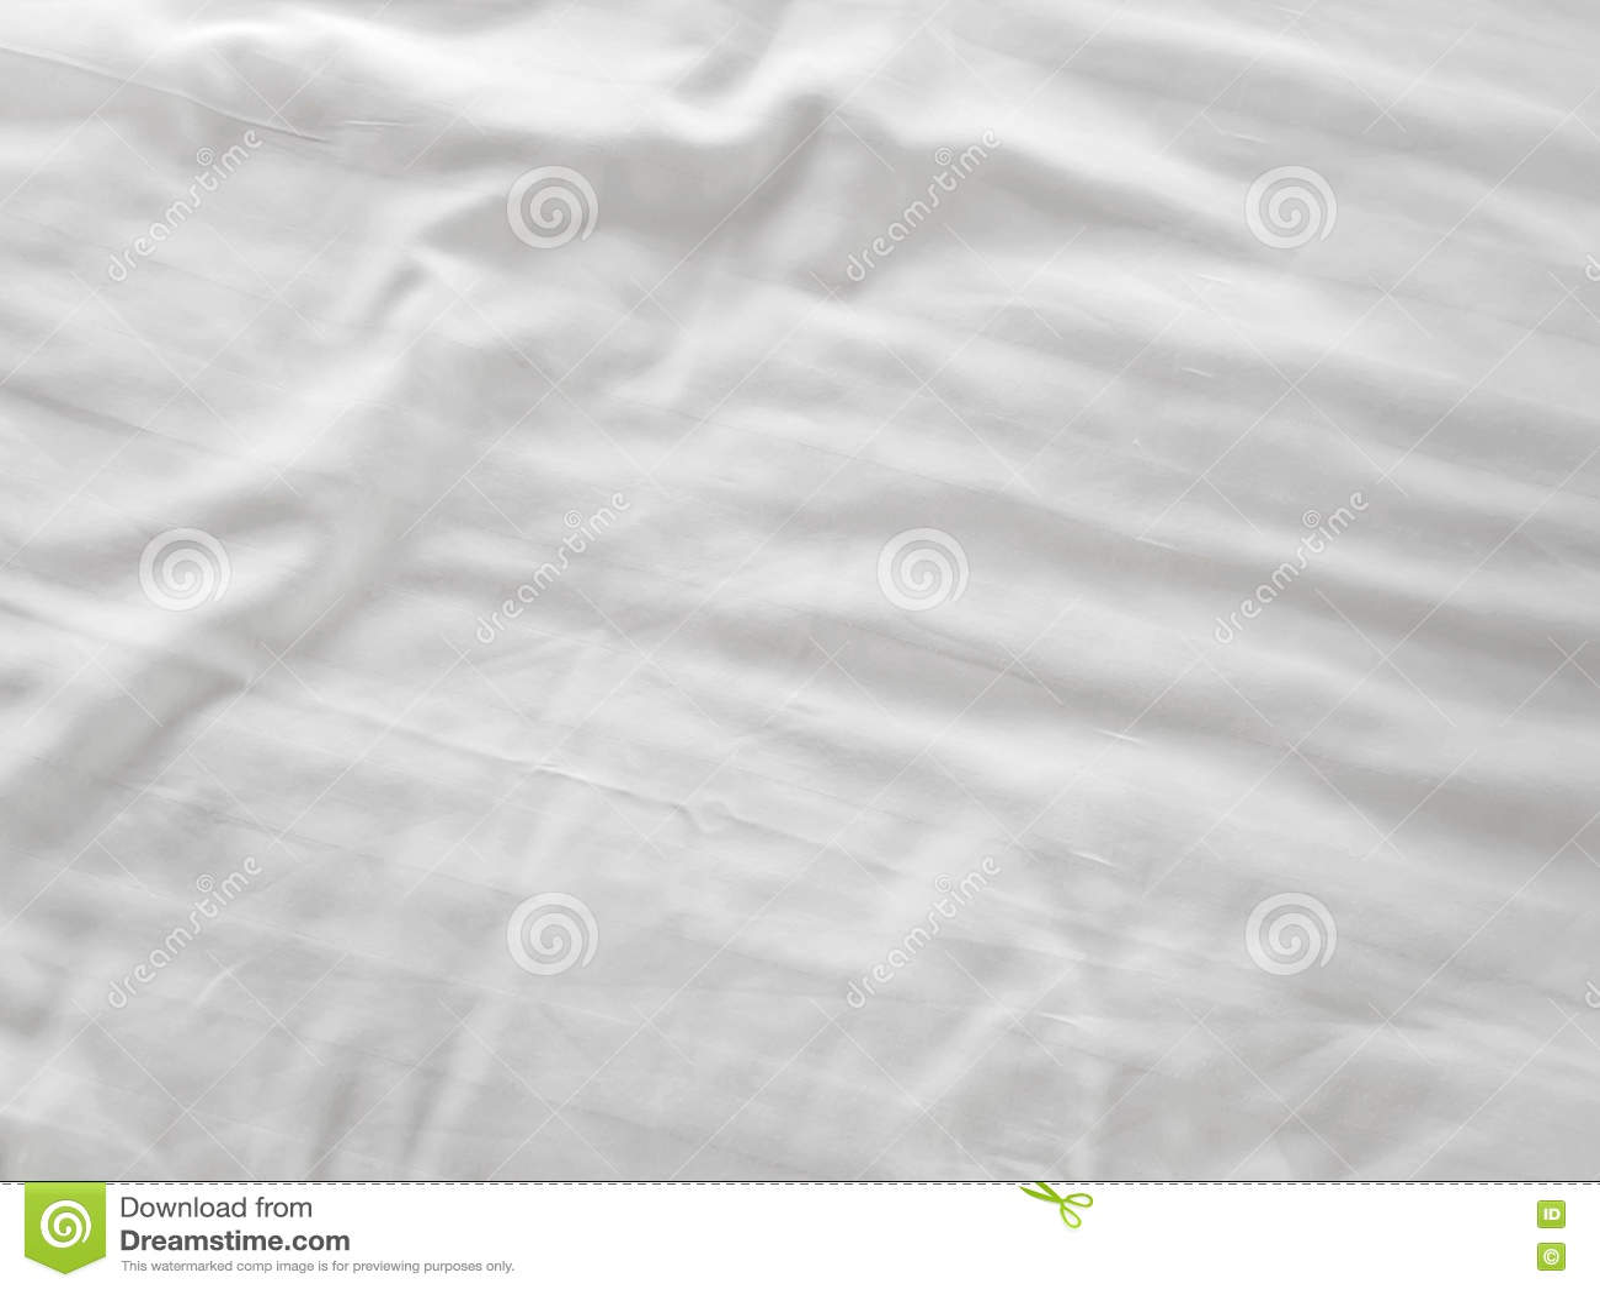 white bed sheet background white aesthetic white fabric bedsheet texture background bedsheet stock image image of cotton cloth 71925605